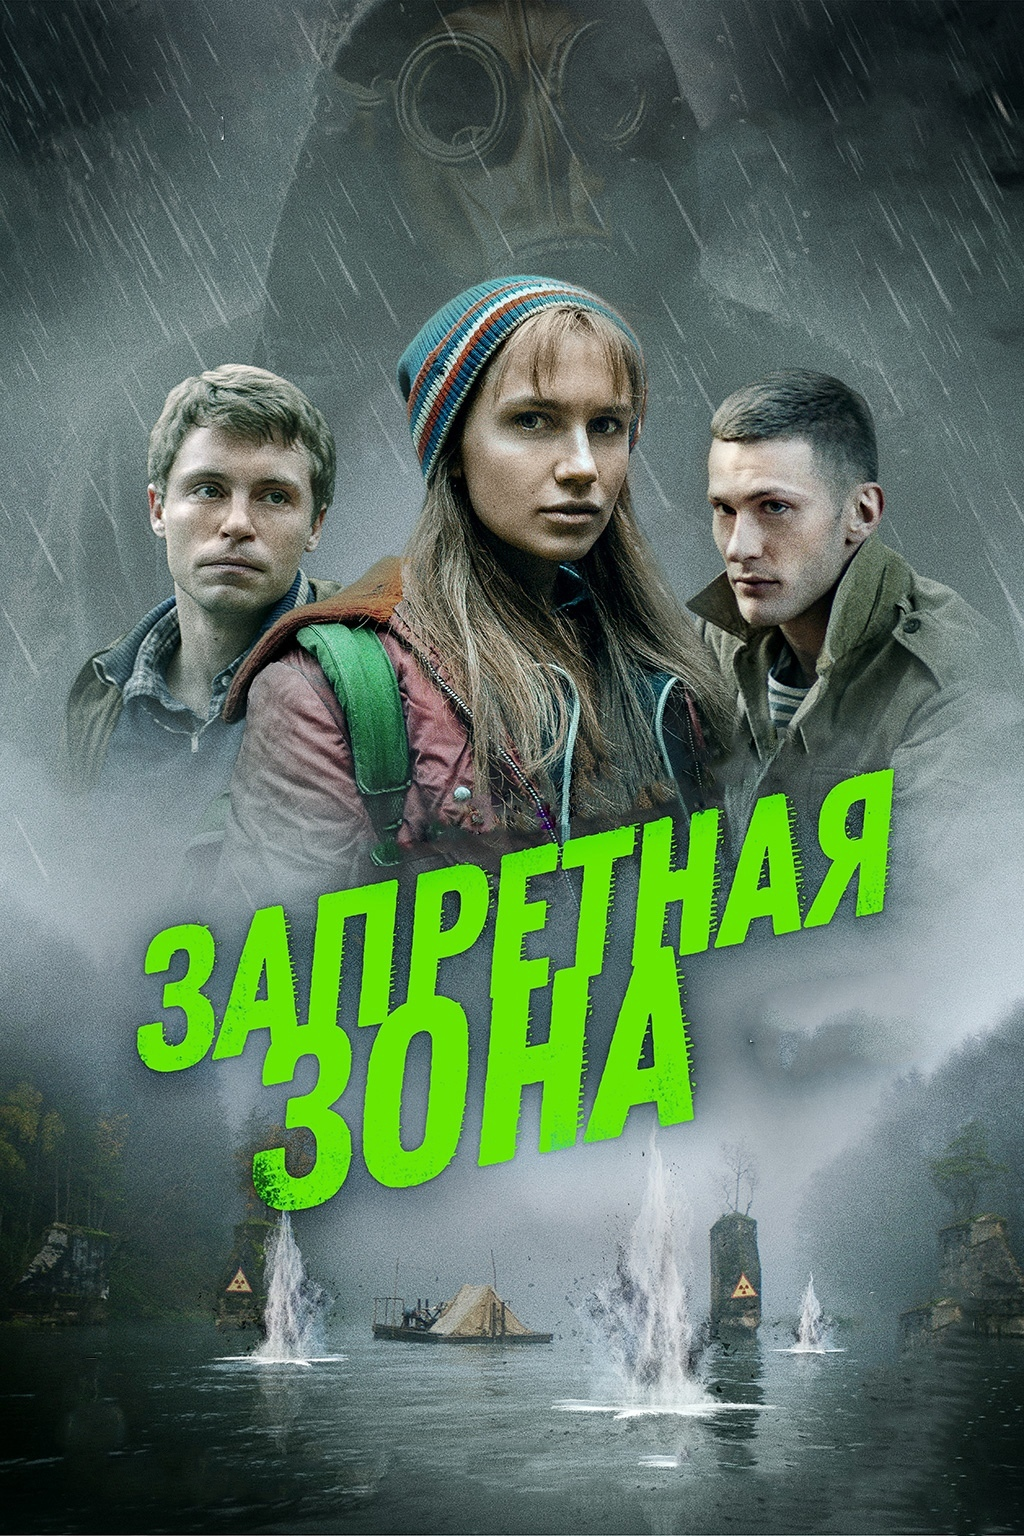 Триллер «Зaпpeтнaя зoнa» (2020) HD